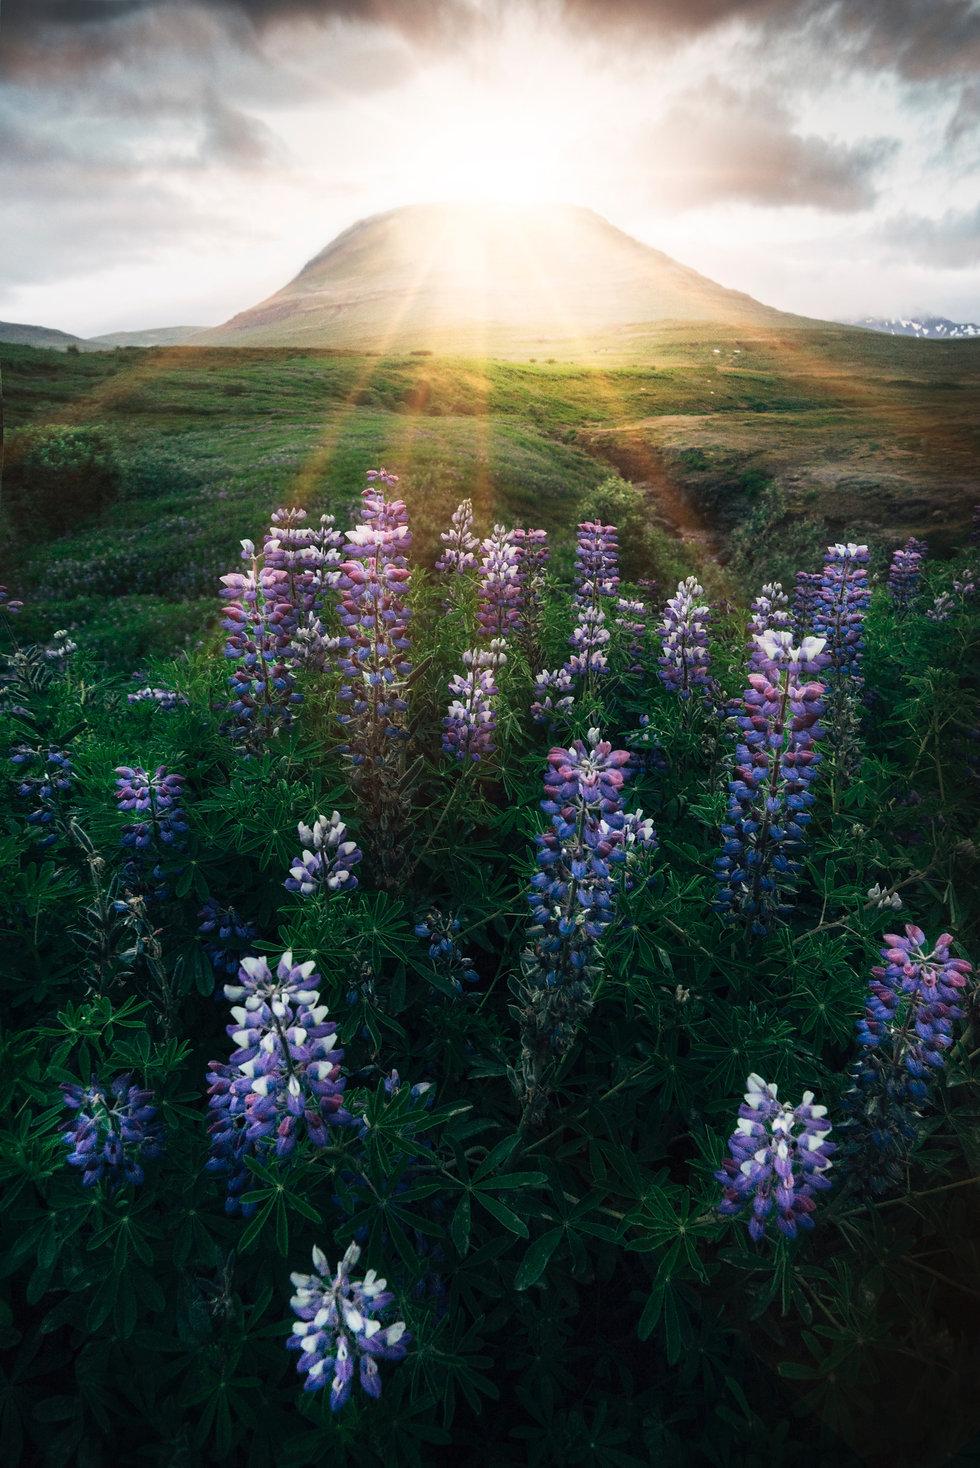 sun flowers nature - Photo by Štefan Štefančík on Unsplash.jpg